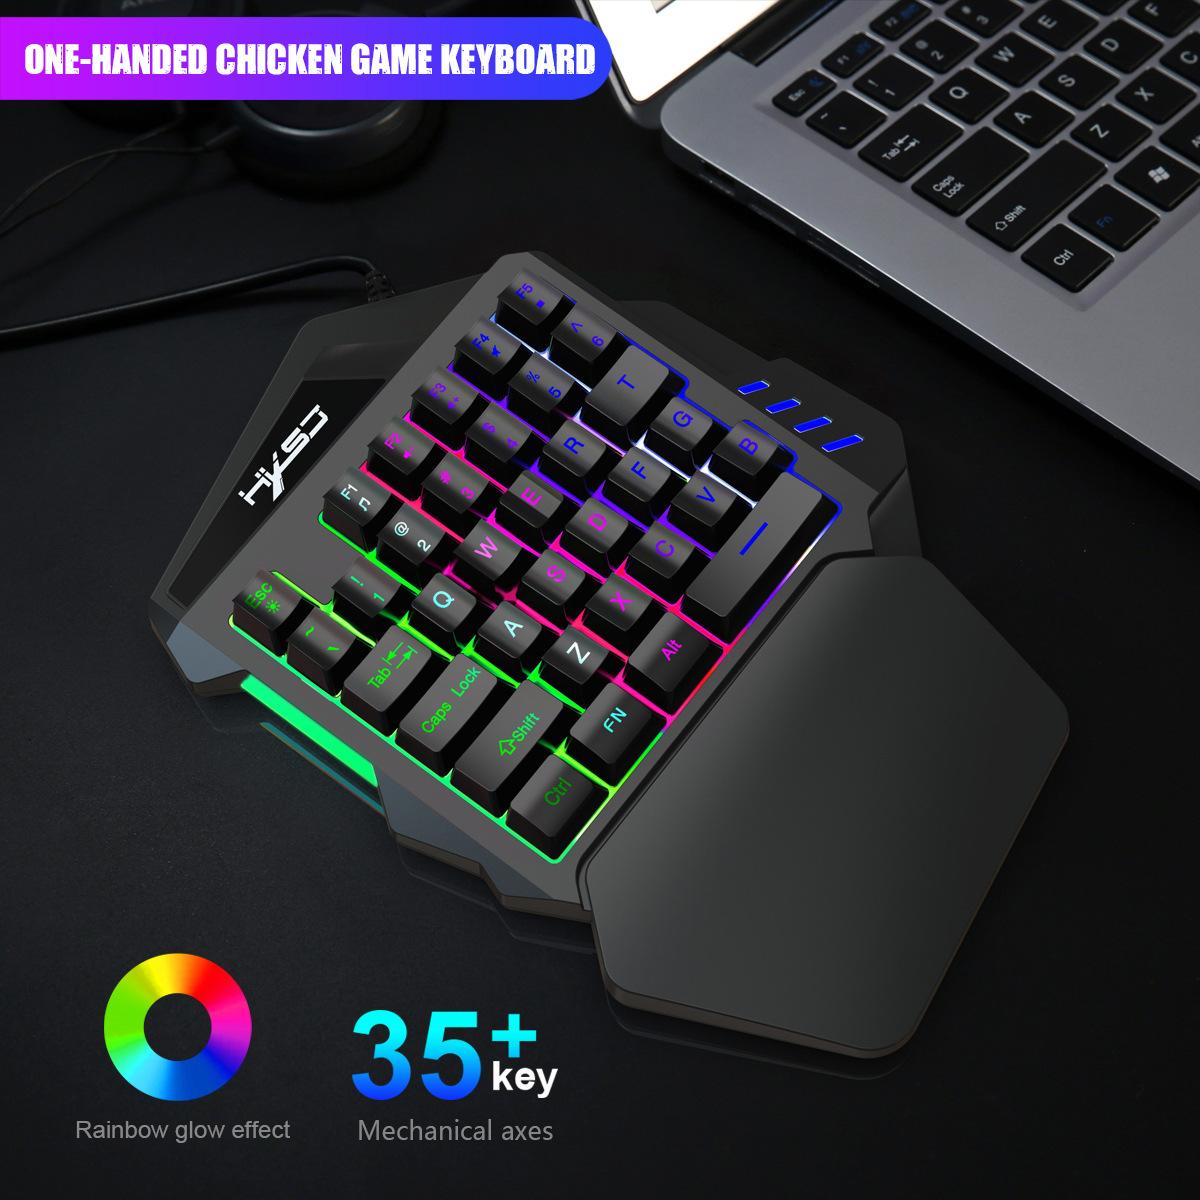 New Ergonomic Multicolor Backlight One-Handed Game Keyboard Mouse Set 35 Keys 5500DPI Gamer Gaming Mouse Keyboard Combos 10